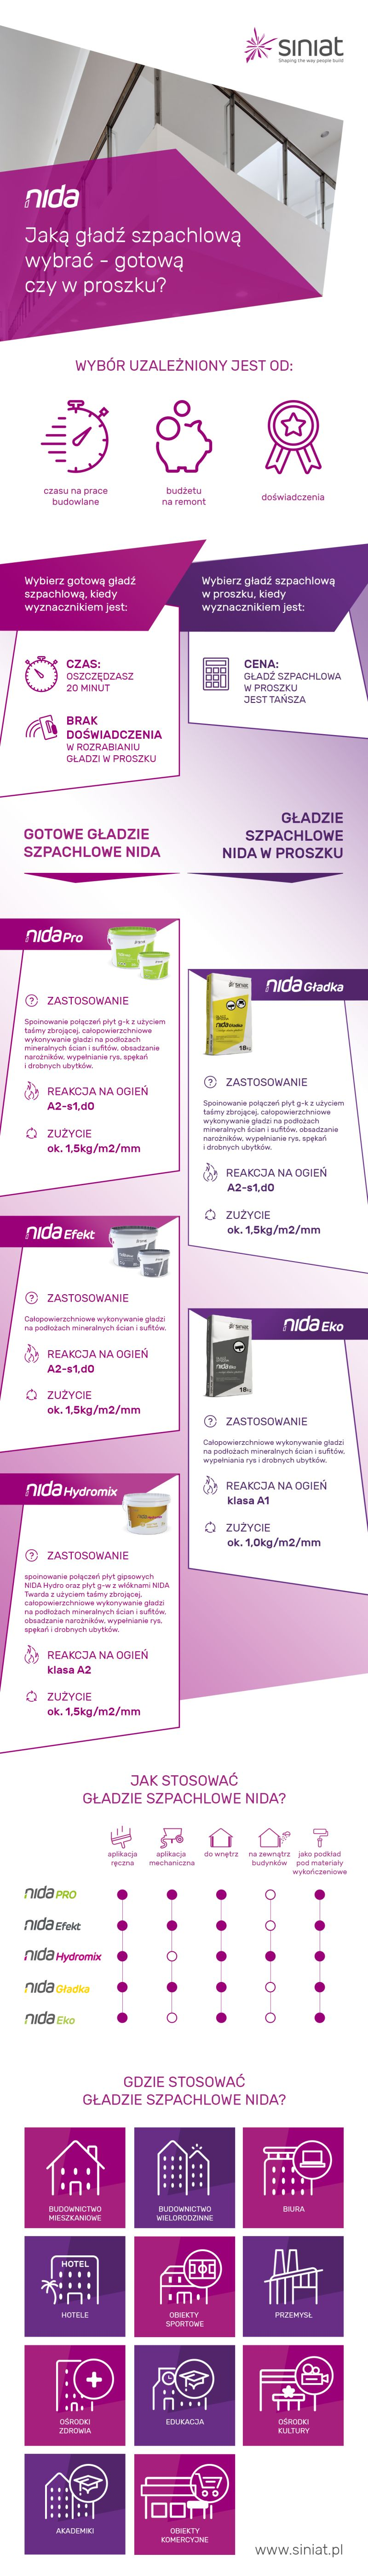 siniat_infografika